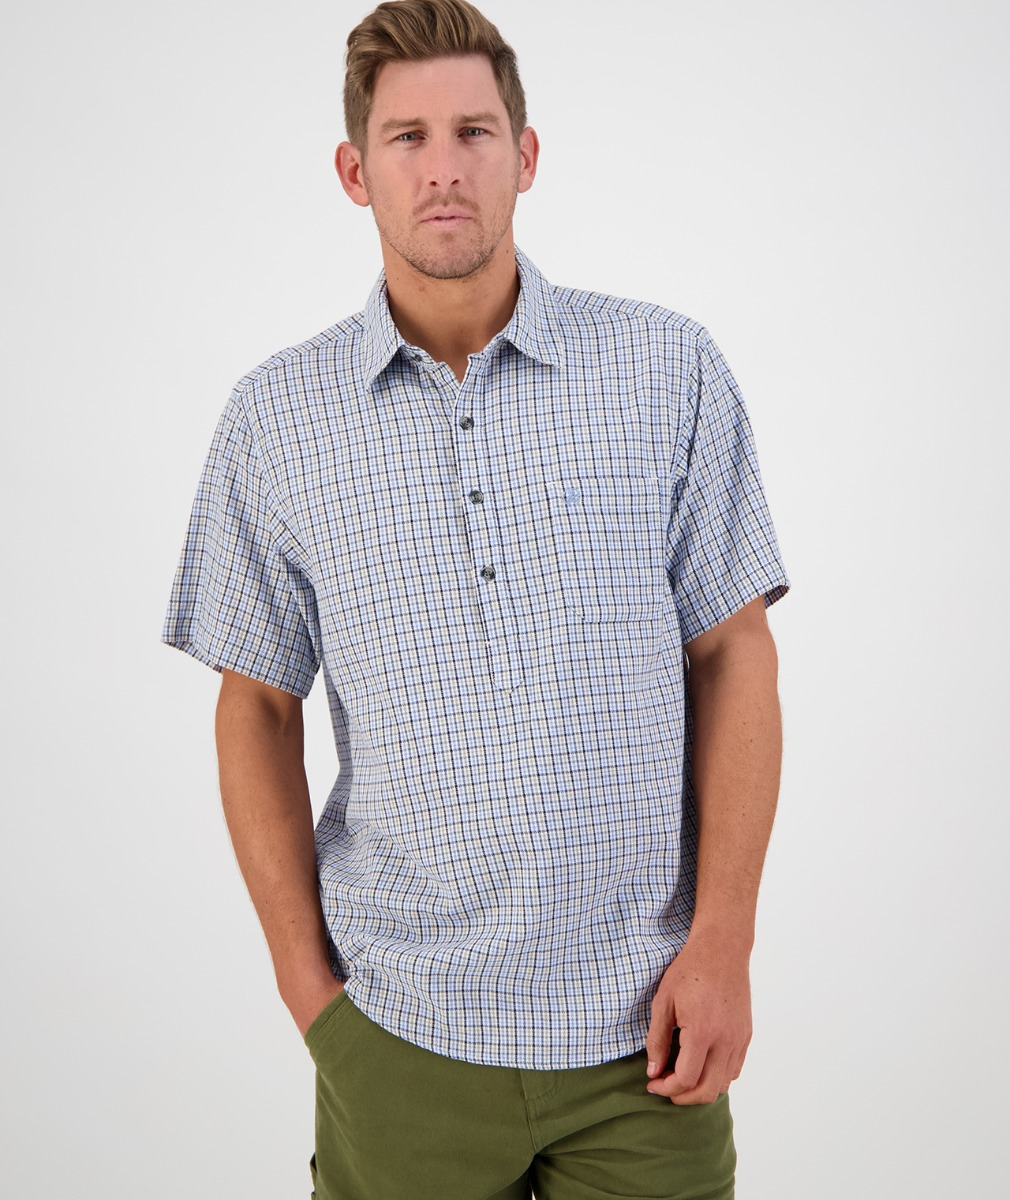 Swanndri Men's Paihia Short Sleeve Shirt in Light Blue/Sage/Navy